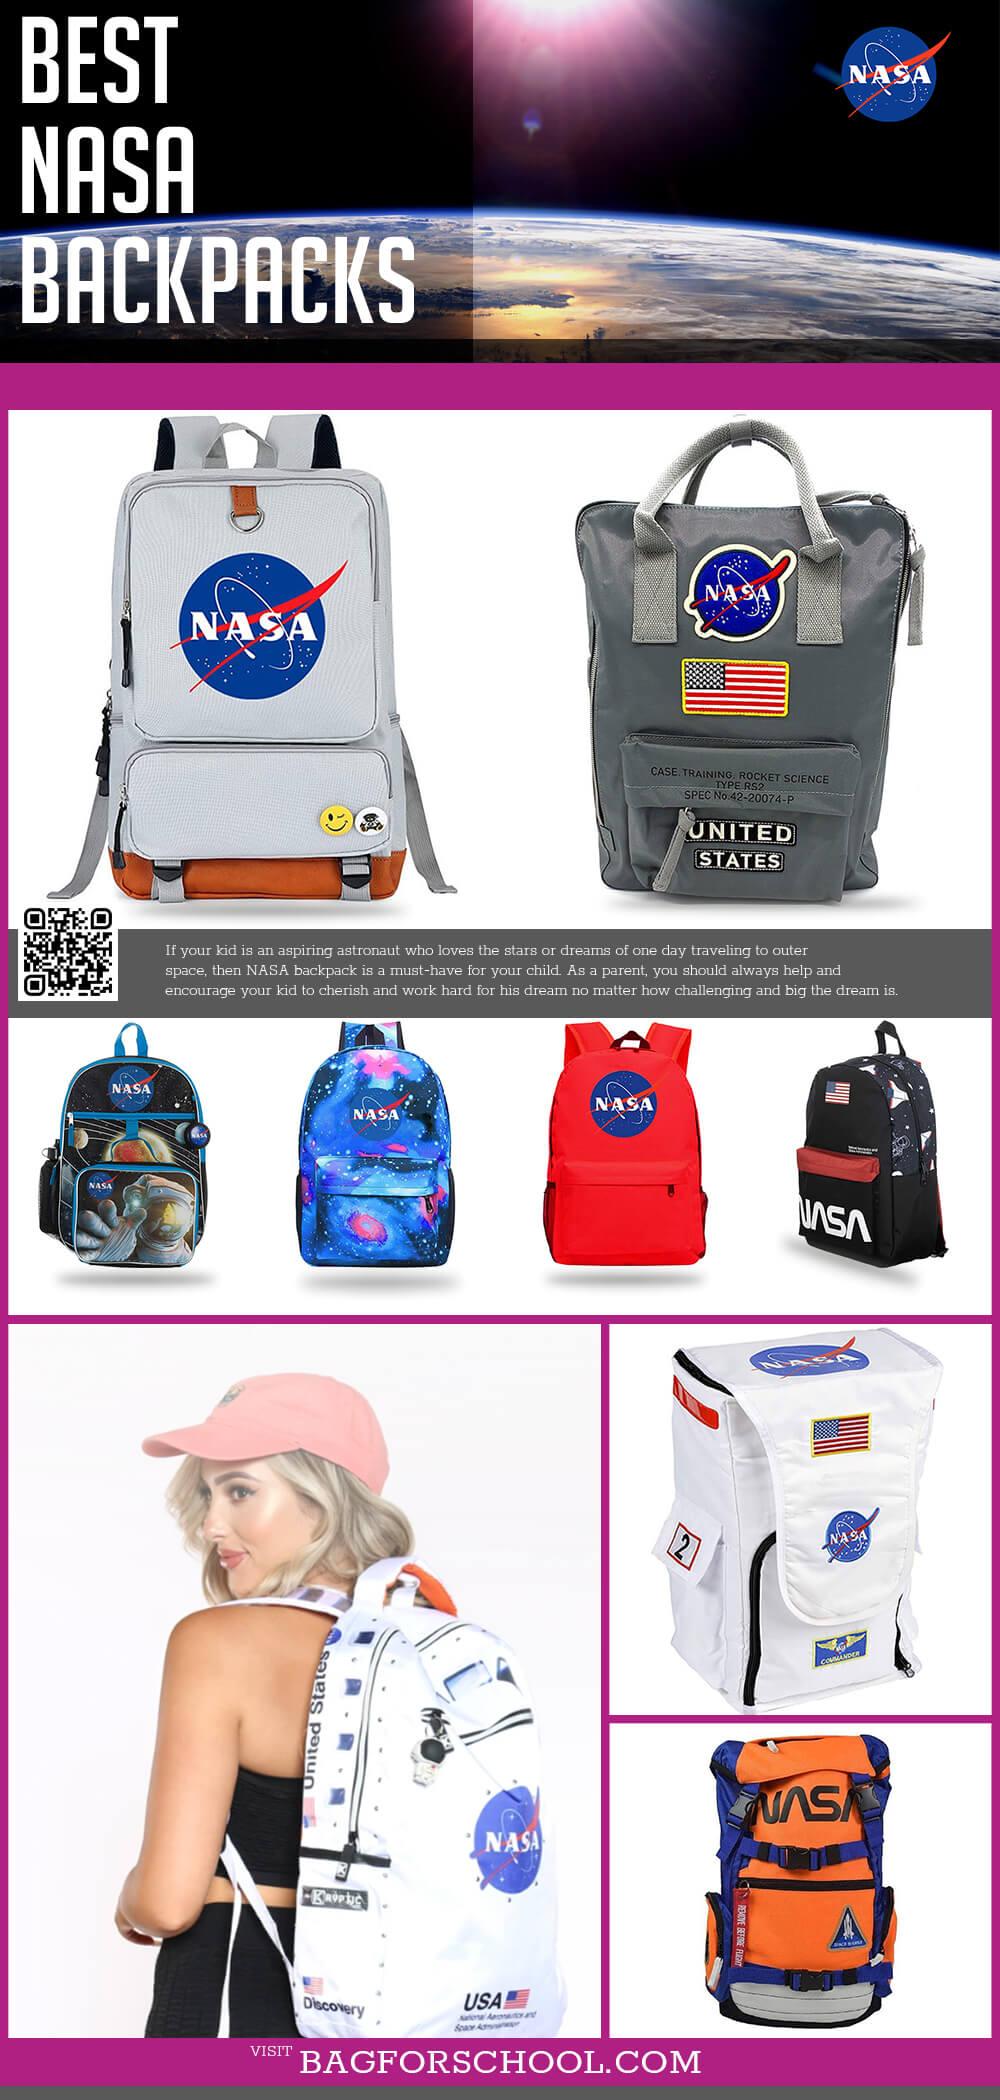 Nasa Backpacks